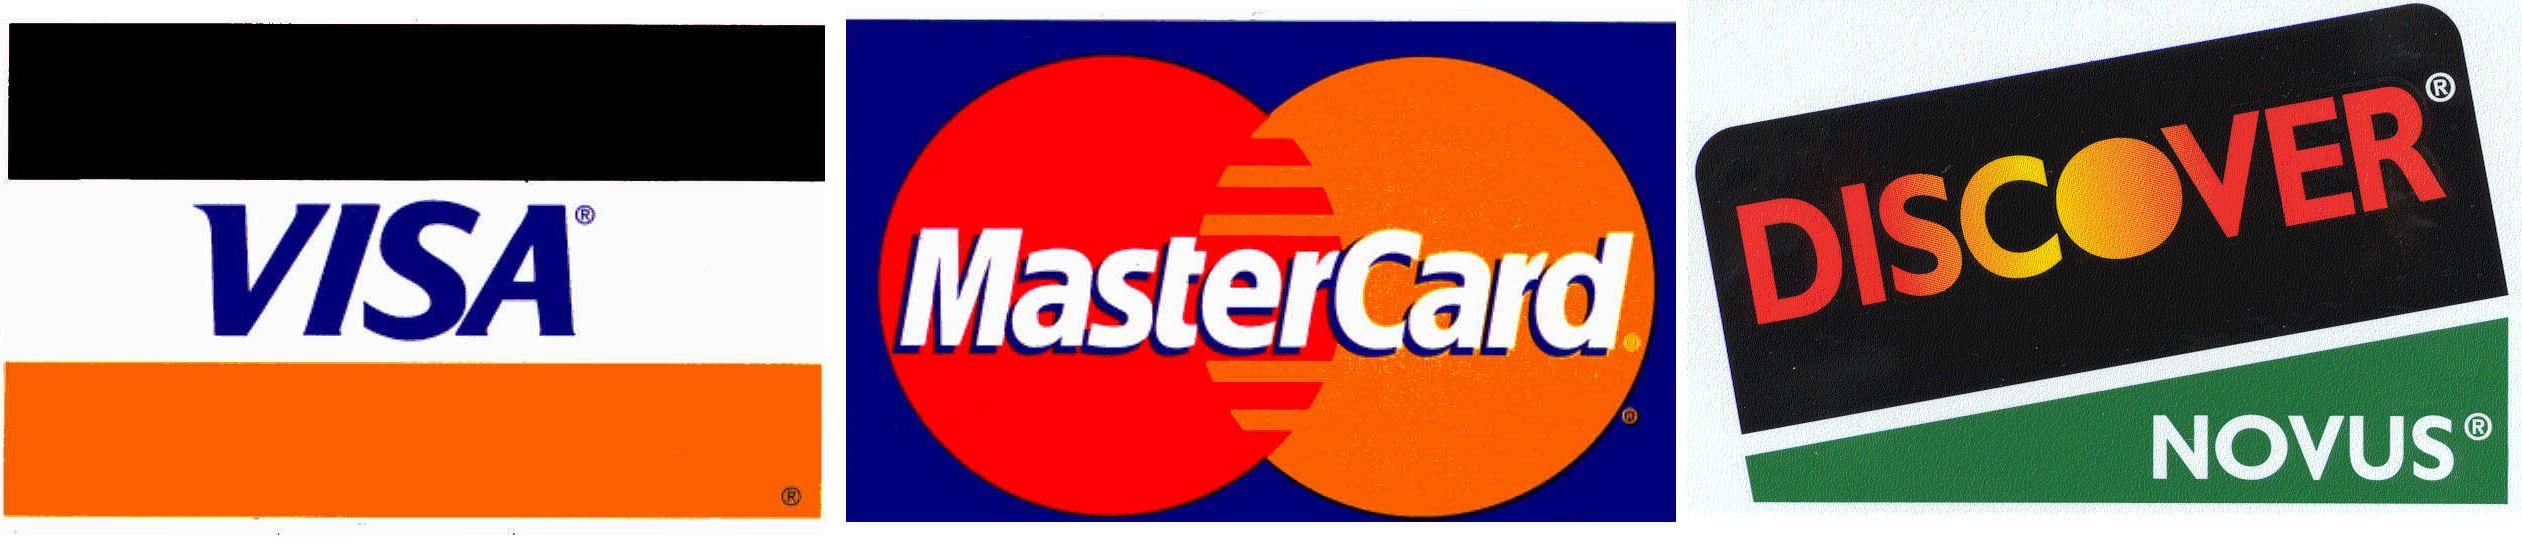 Visa MasterCard Discover Credit Card